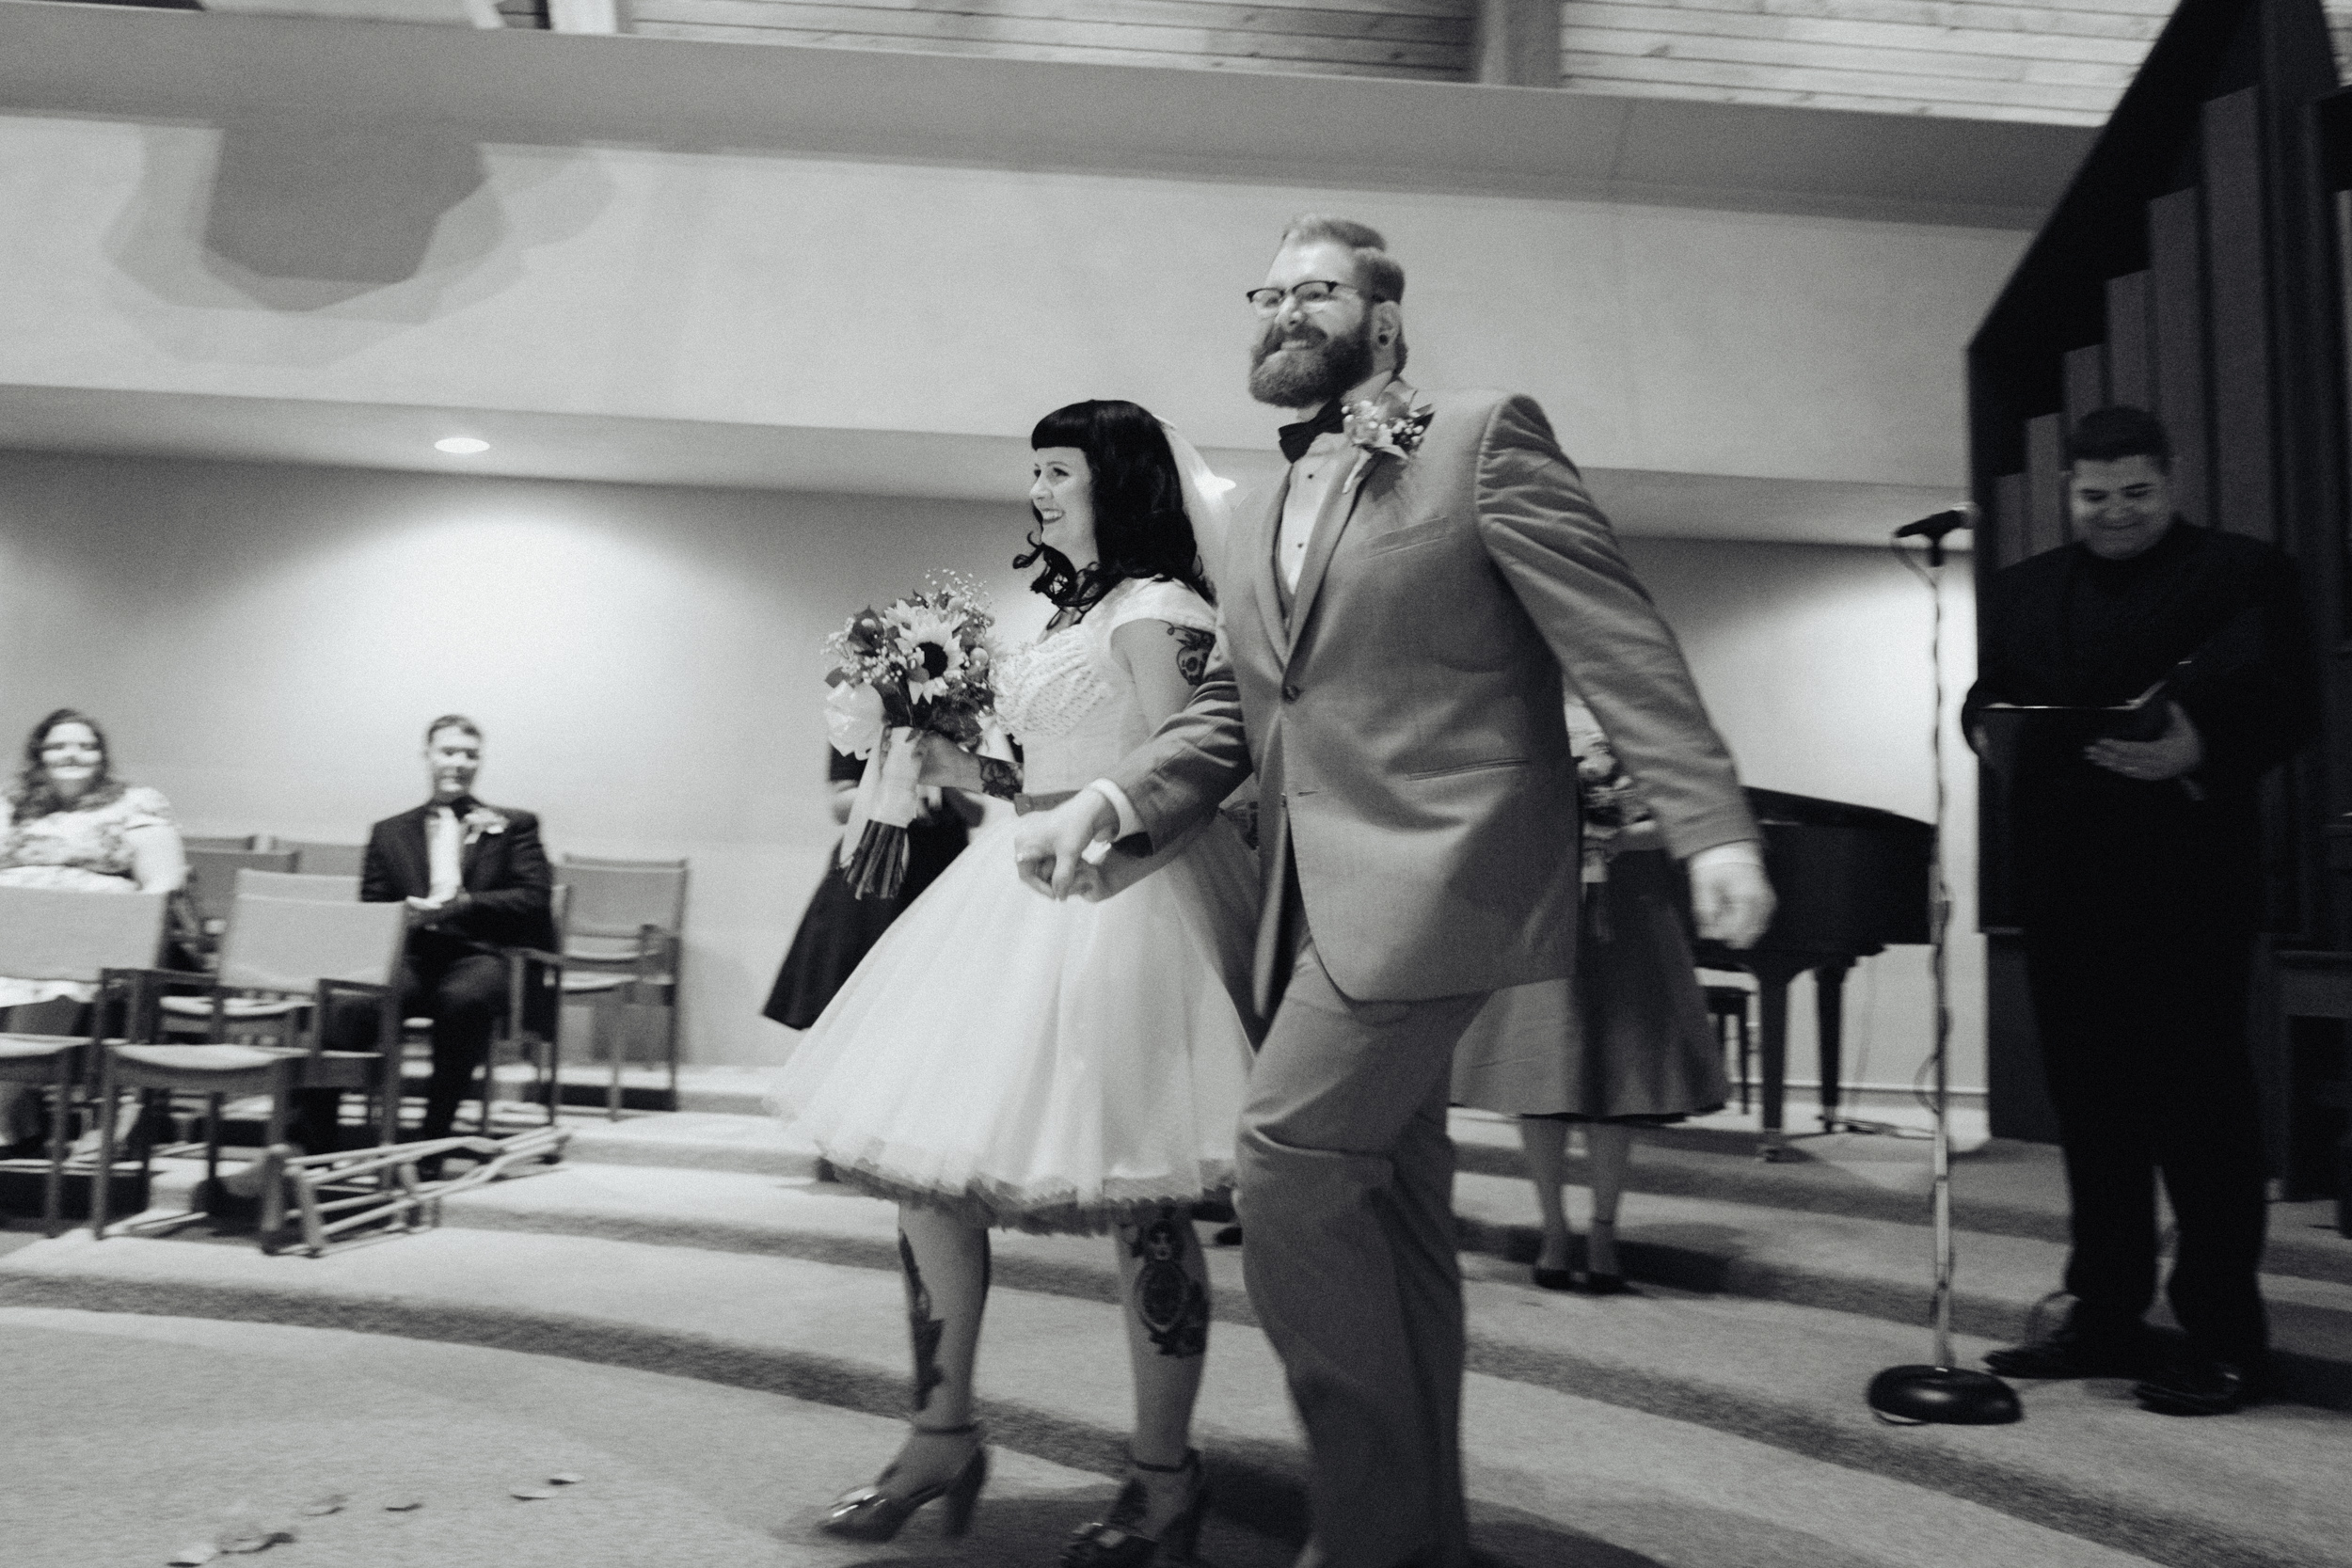 Christian & Sarah wedding photography by Brian milo-173.jpg